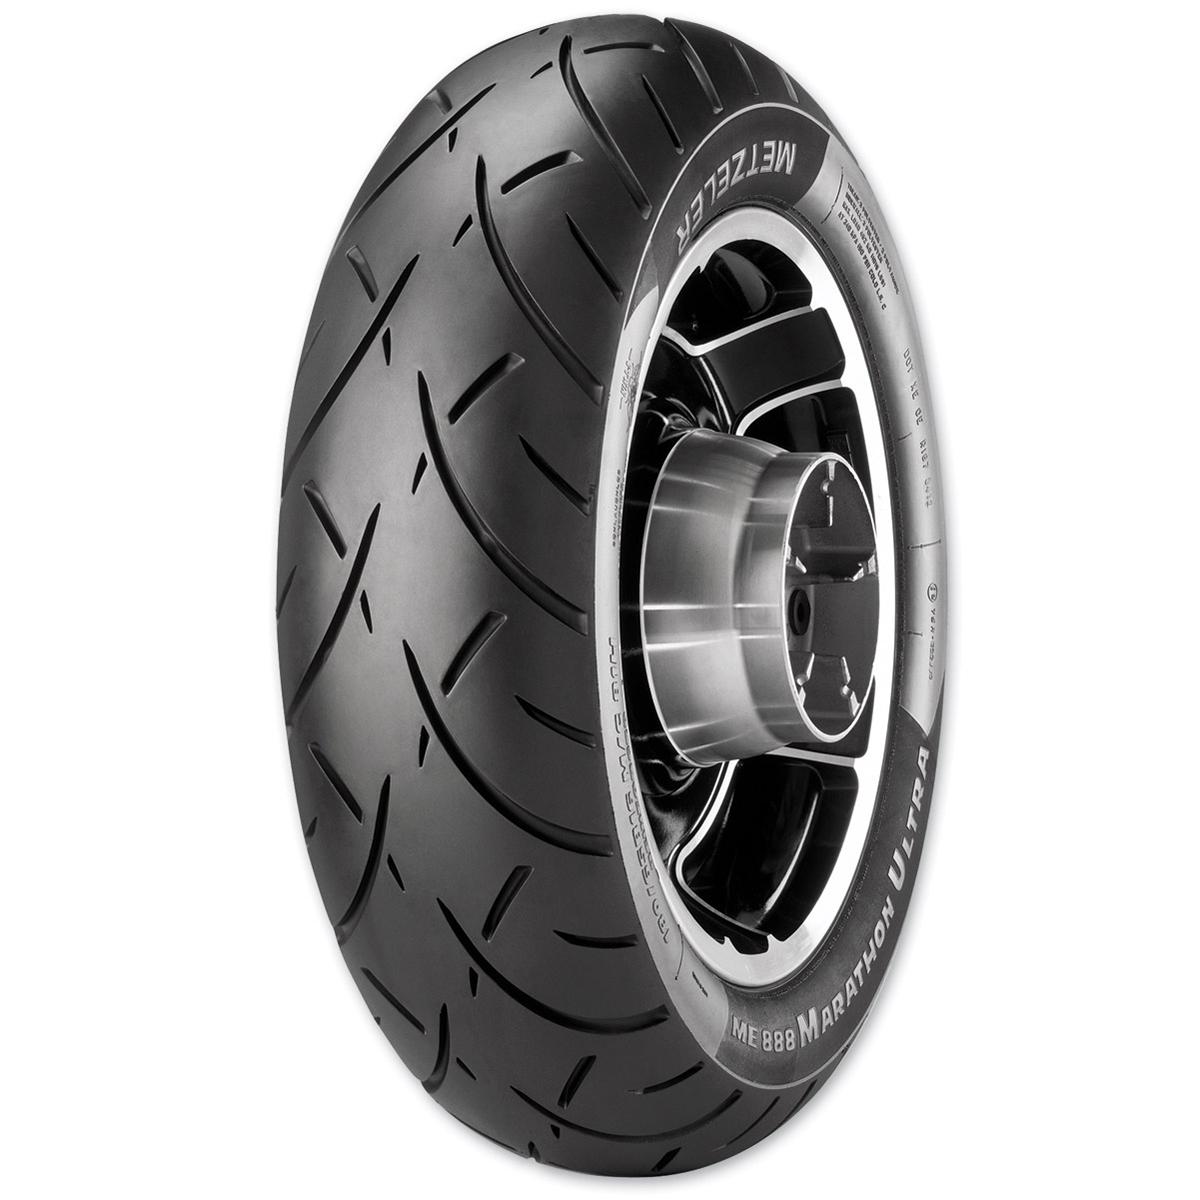 Metzeler ME 888 120/70 ZR 19 Tubeless 60 W Front Two-Wheeler Tyre